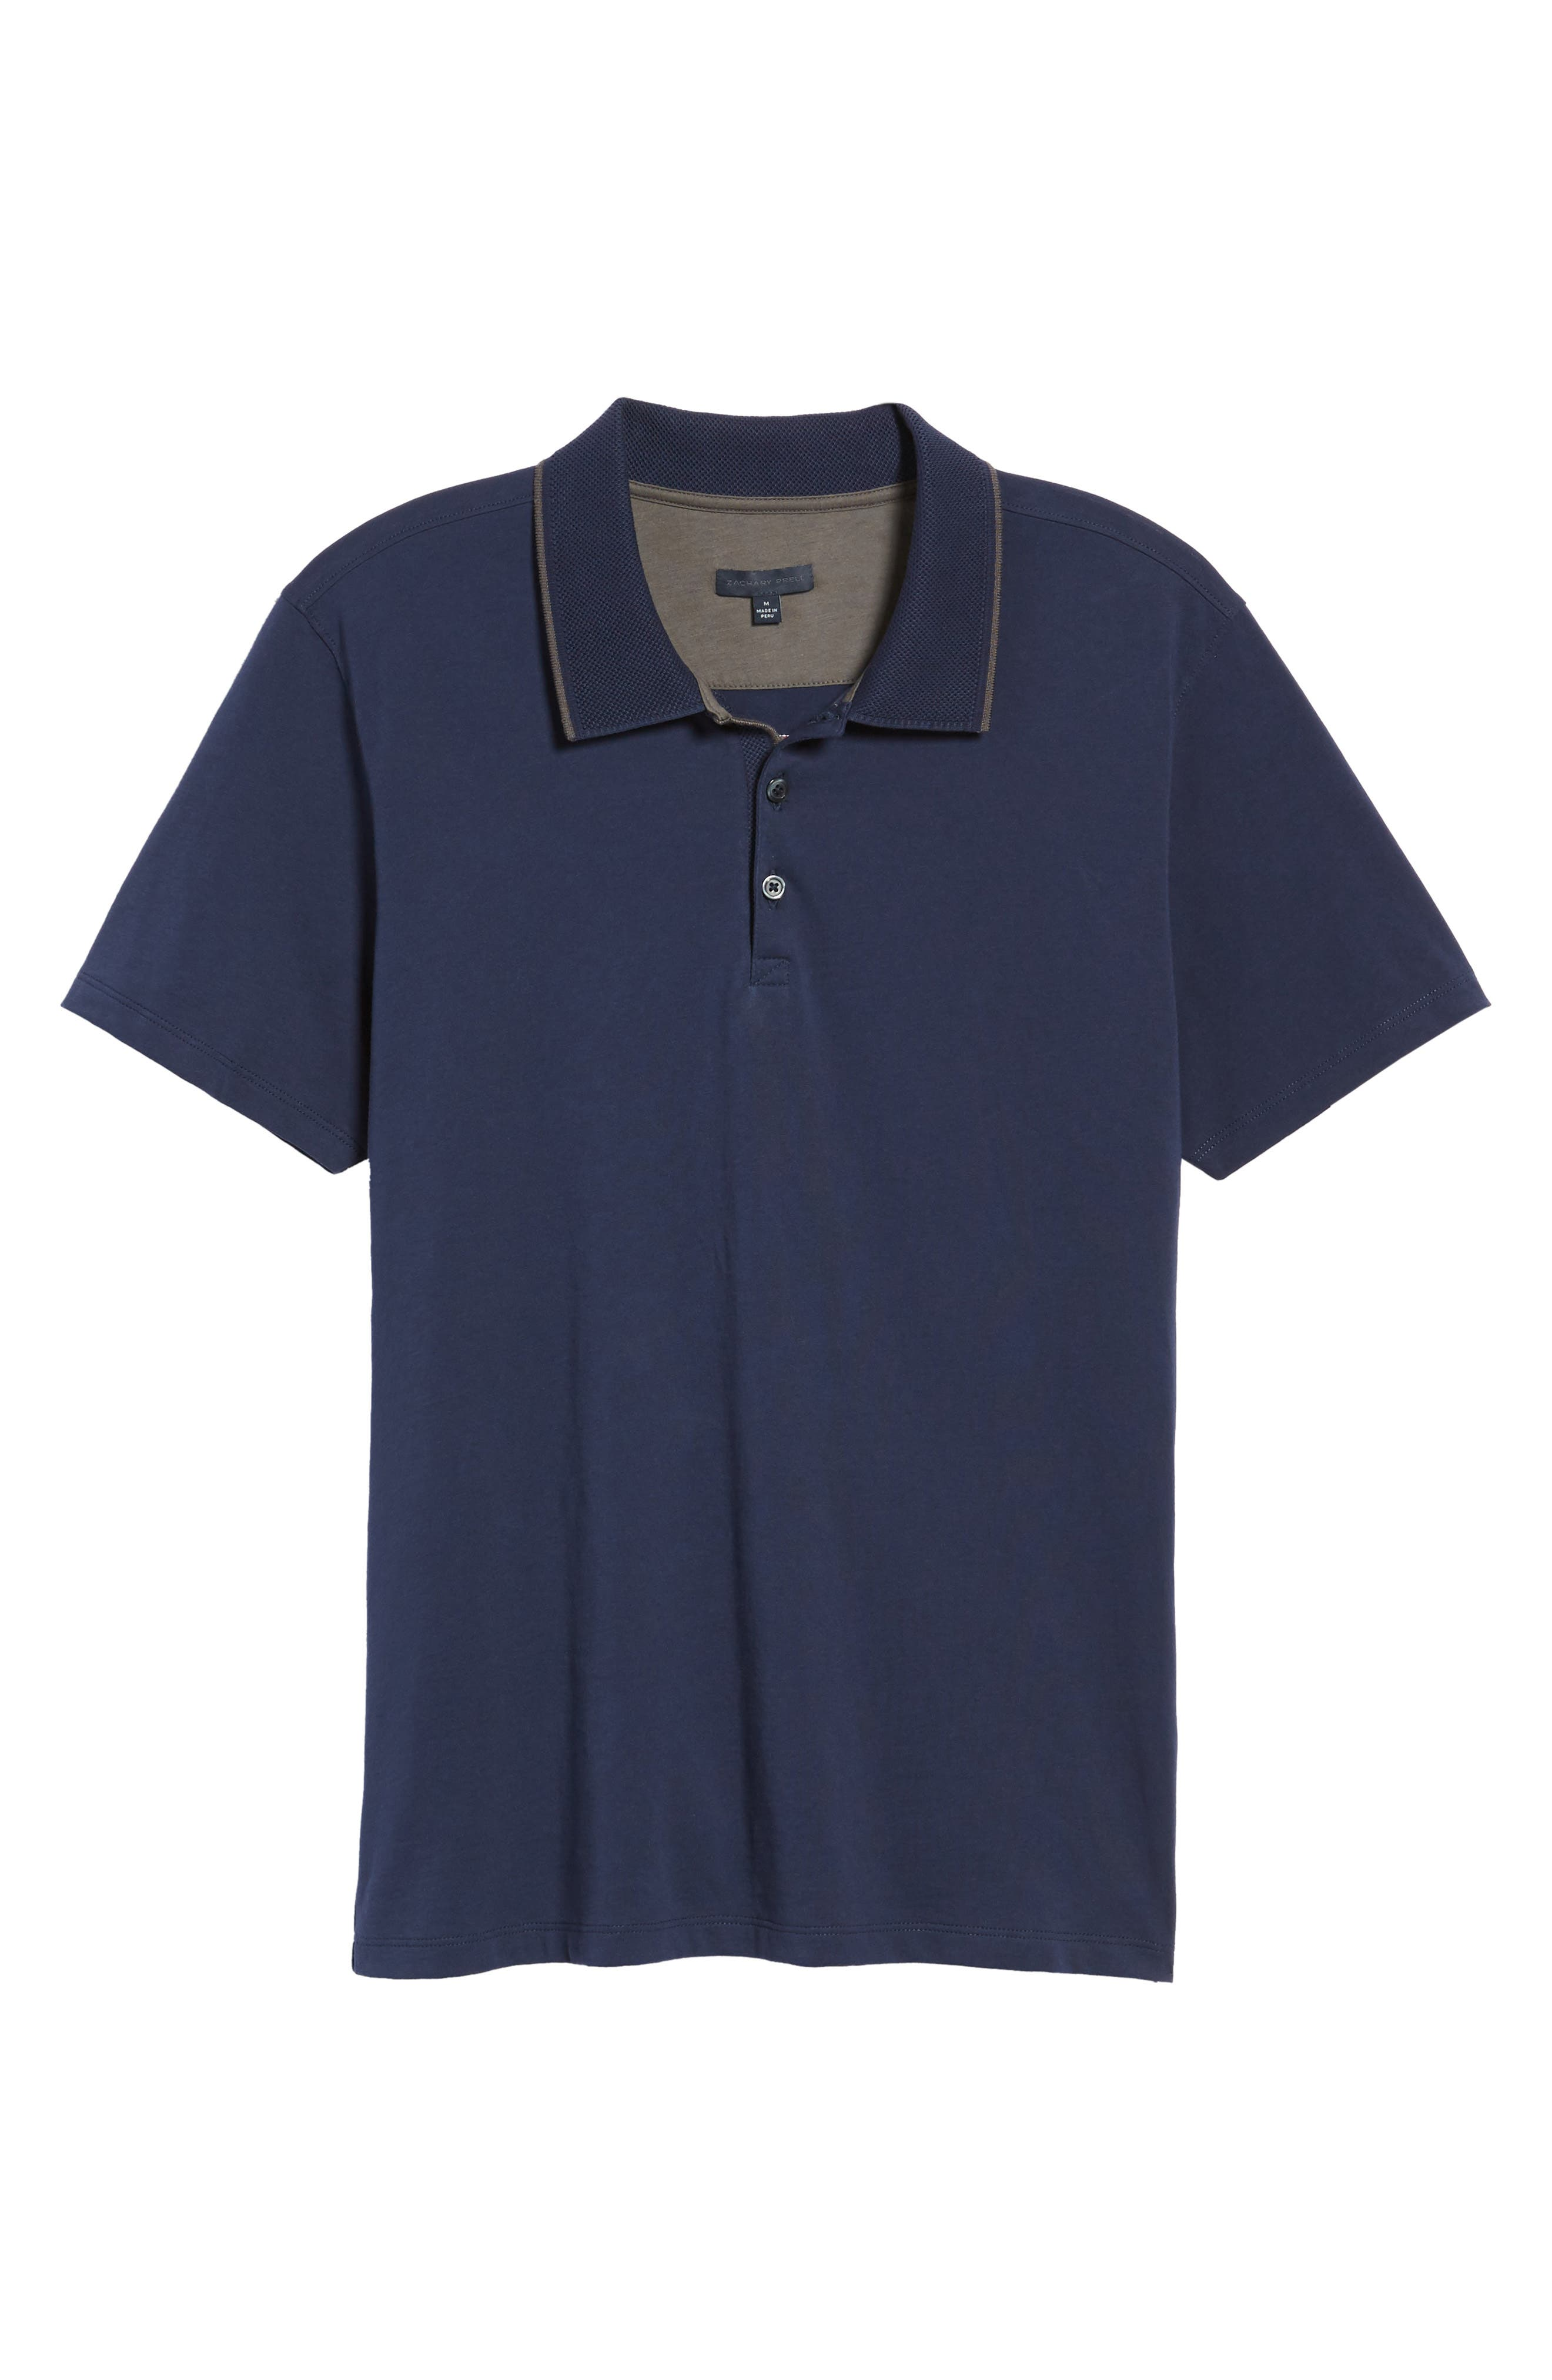 Grindstone Slim Fit Polo,                             Alternate thumbnail 6, color,                             410